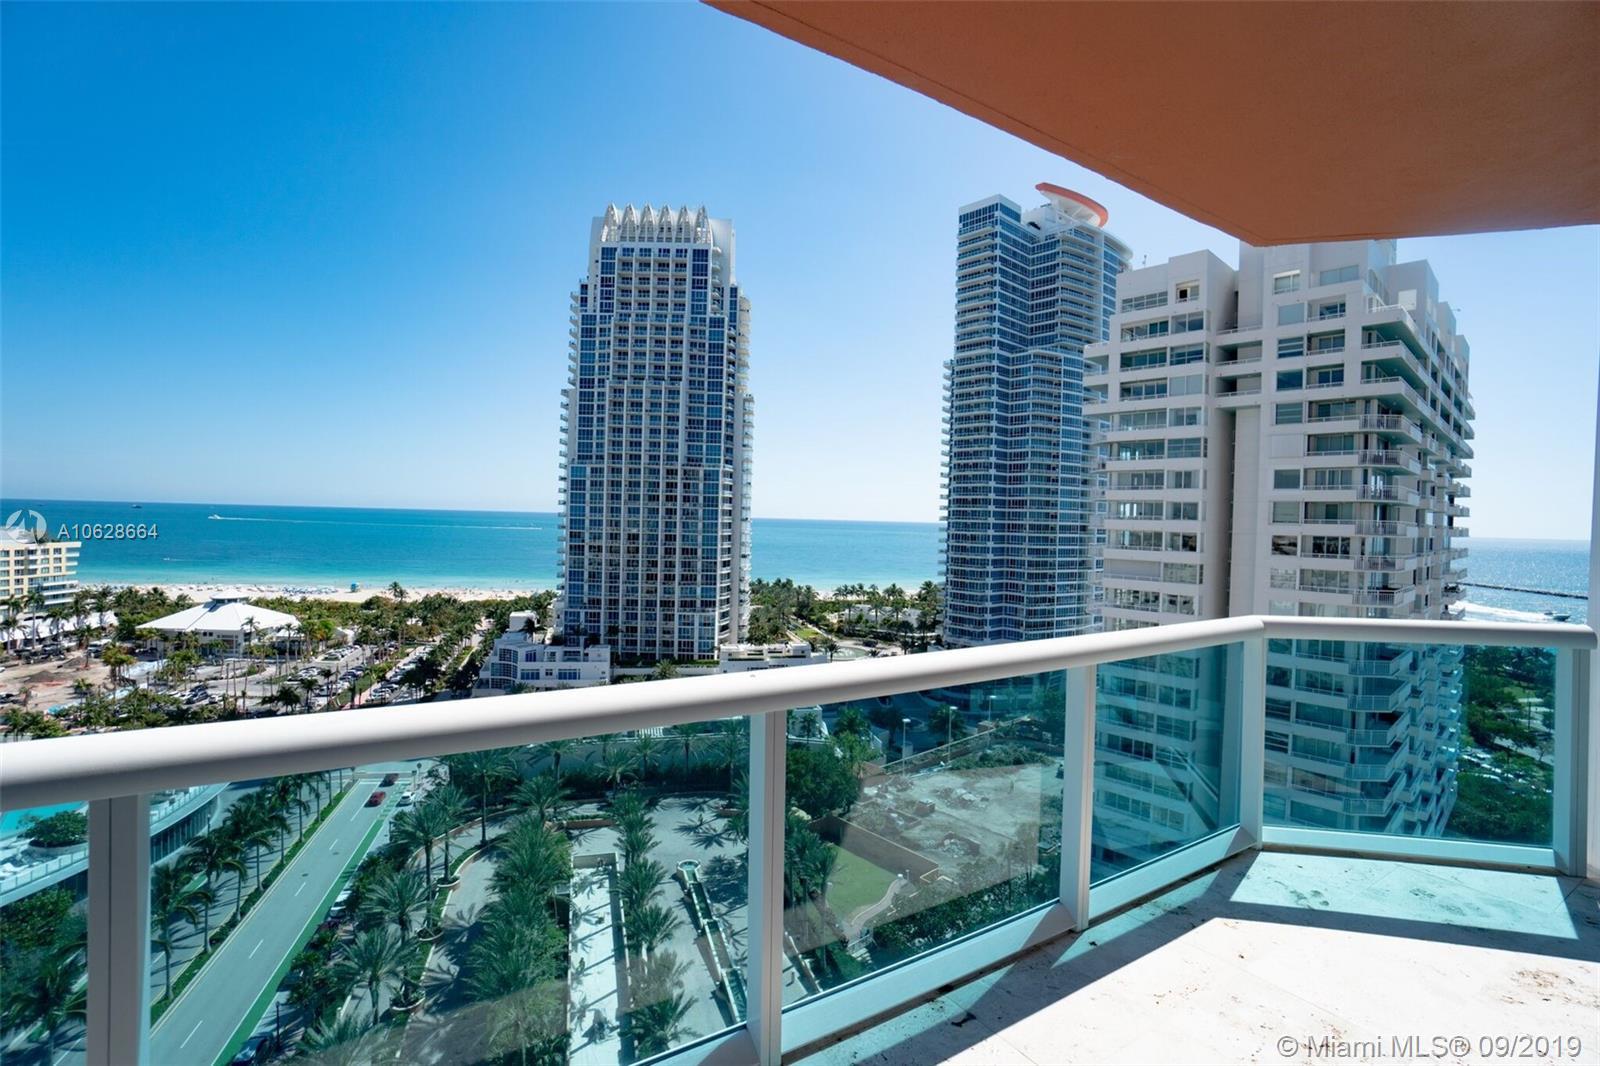 300 S Pointe Dr 1705, Miami Beach, FL 33139